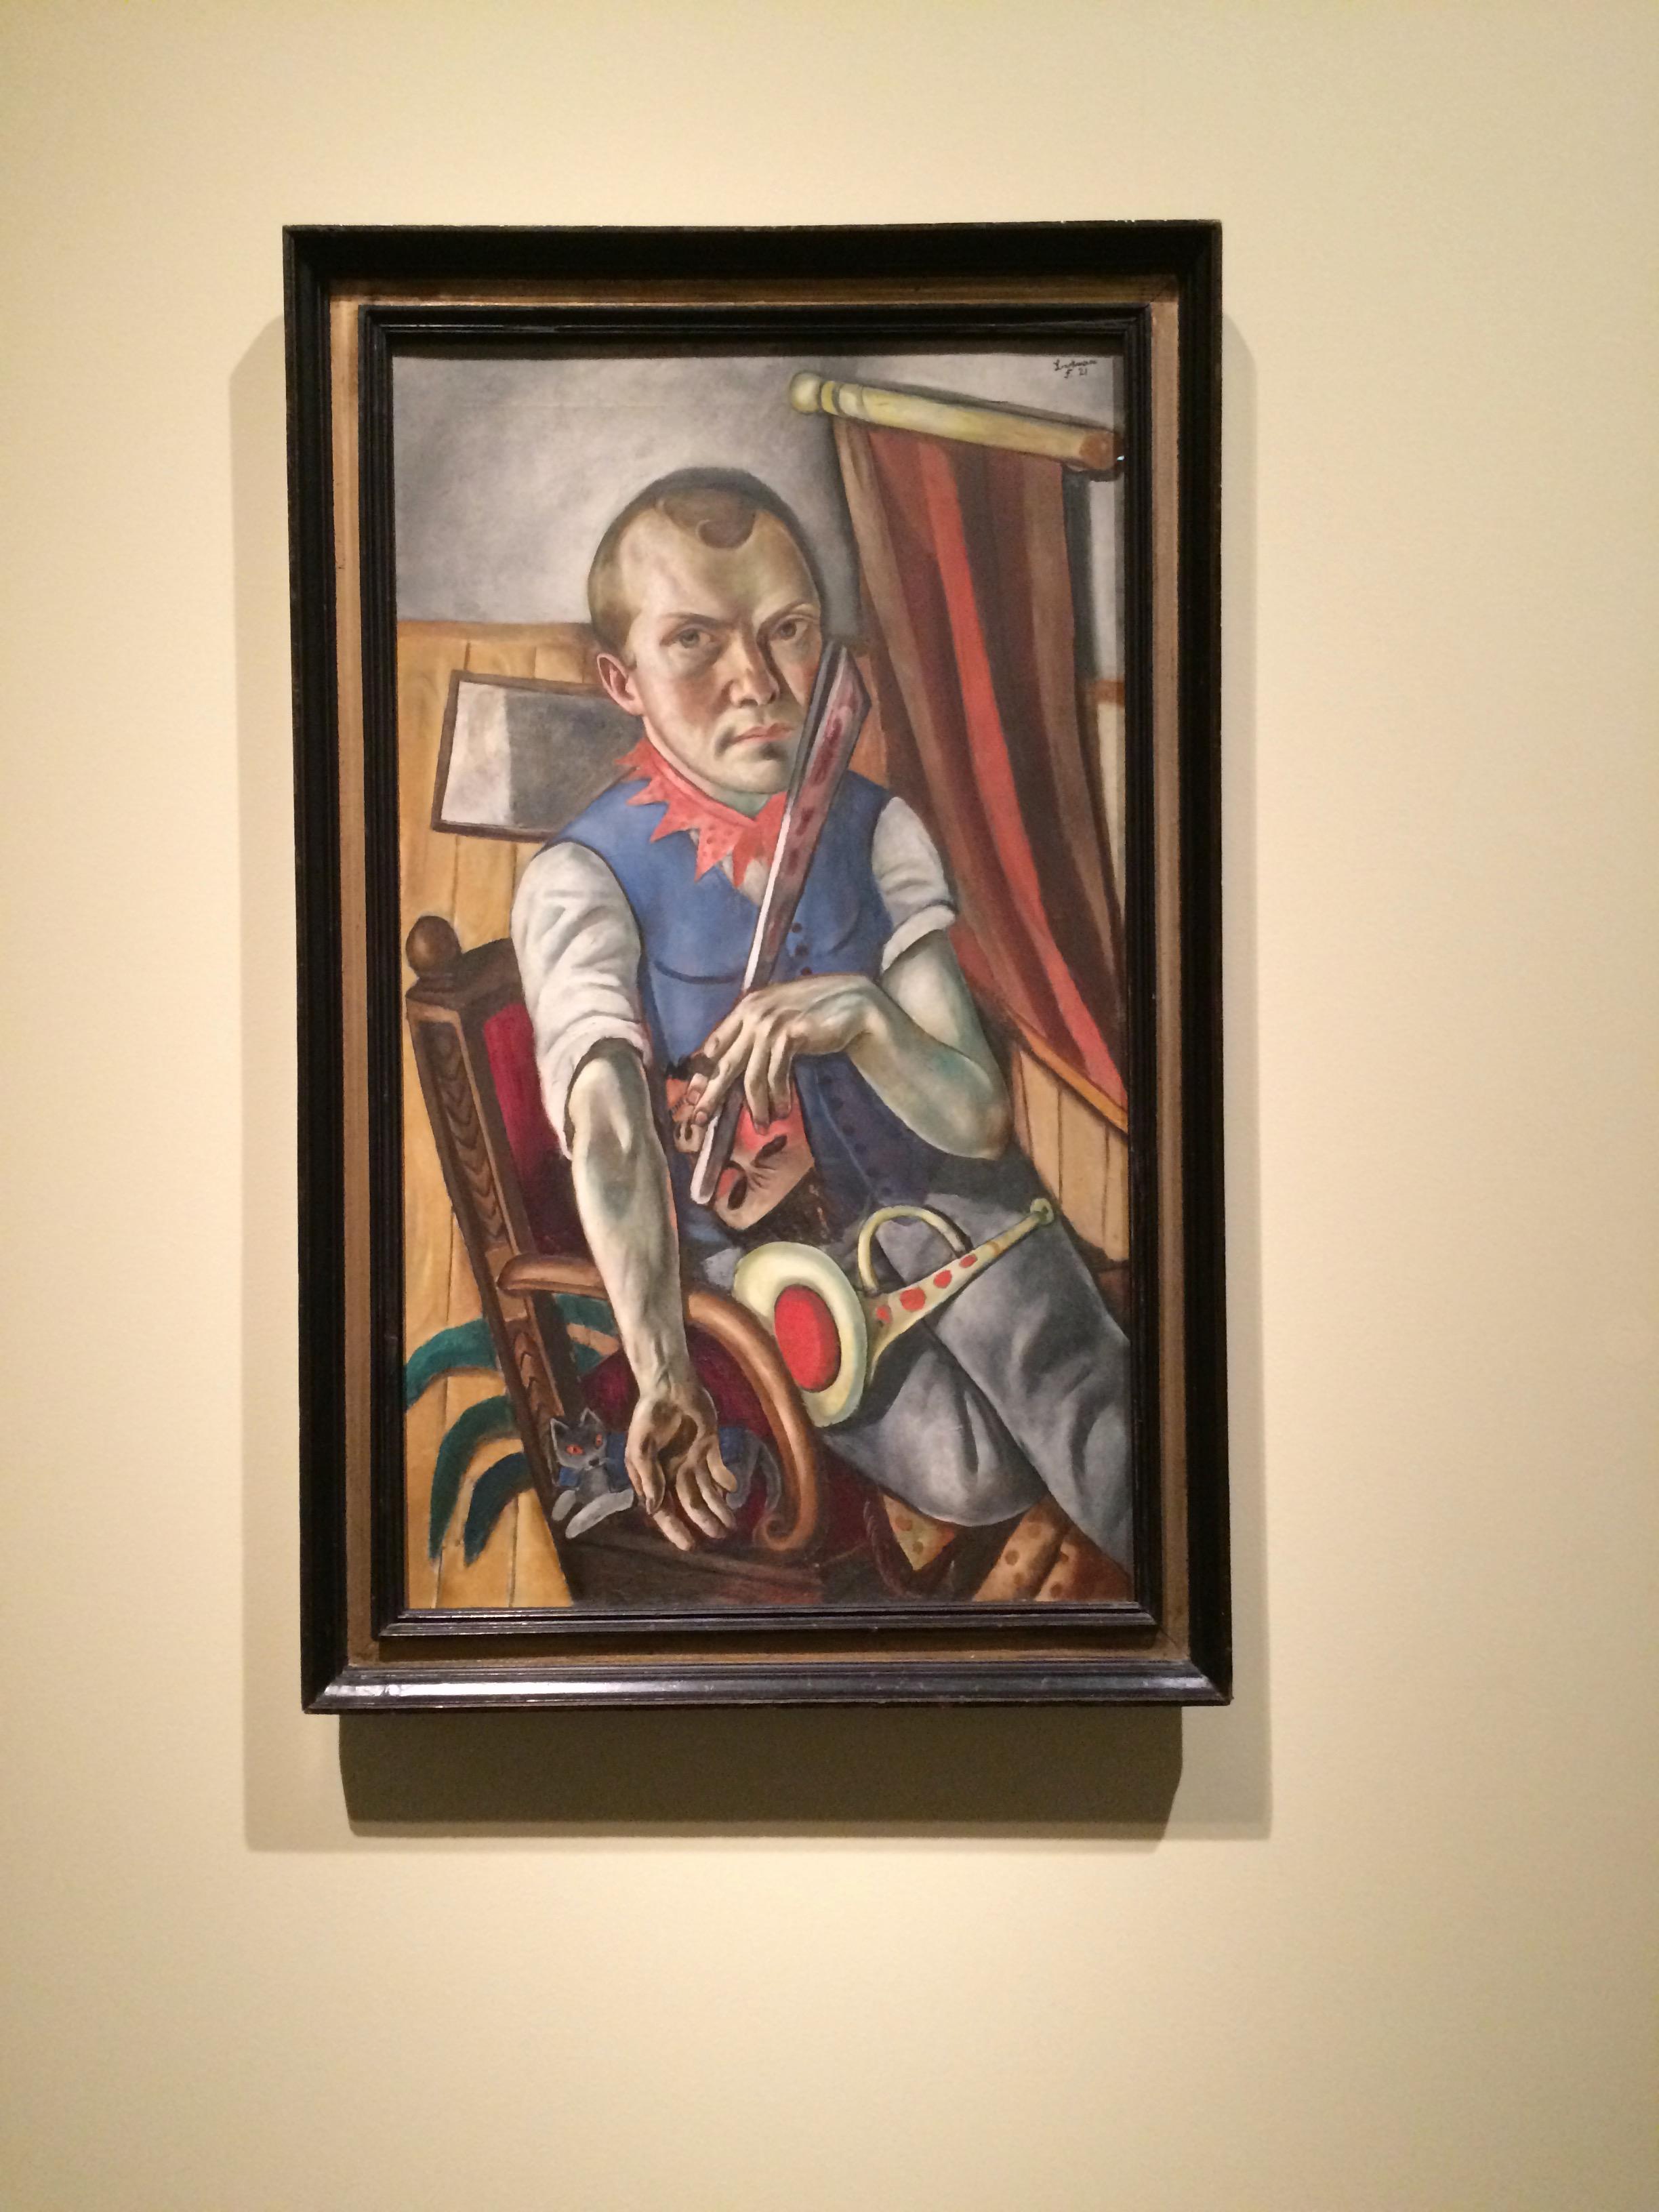 Max Beckmann. Autoretrat com a pallasso. 1921